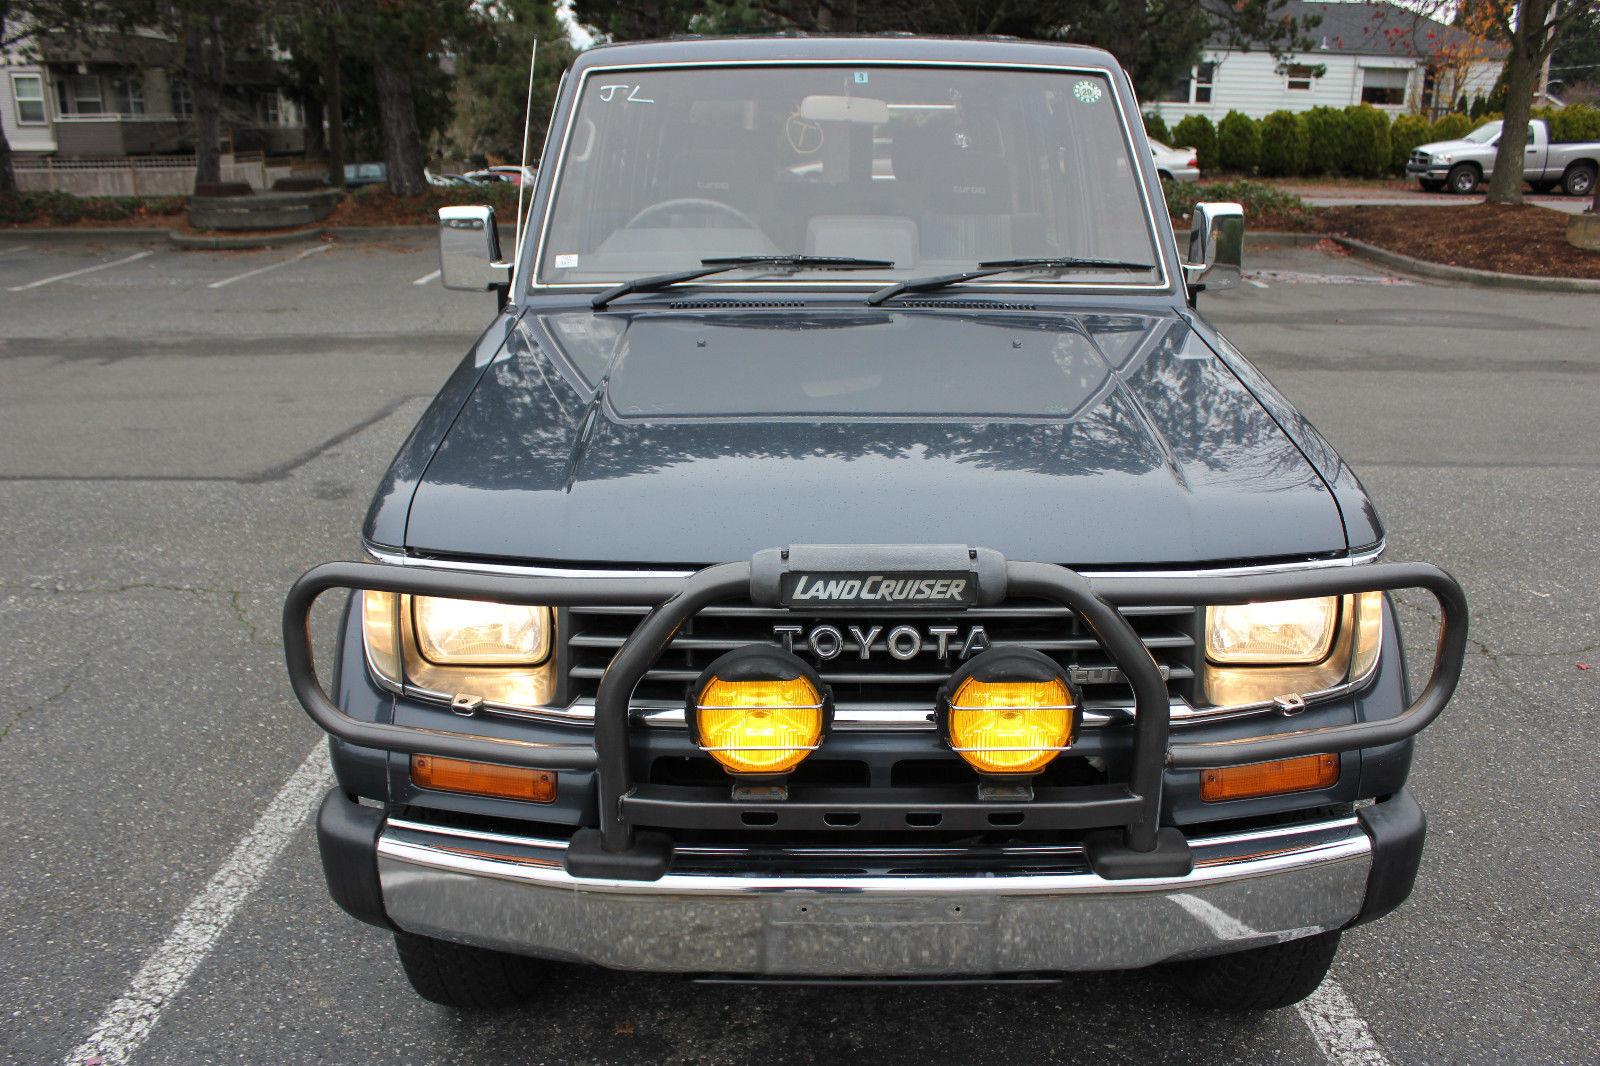 Toyota Land Cruiser Diesel >> Great 1991 Toyota Land Cruiser Sx Toyota Landcruiser Prado 1991 Turbo Diesel 2017 2018